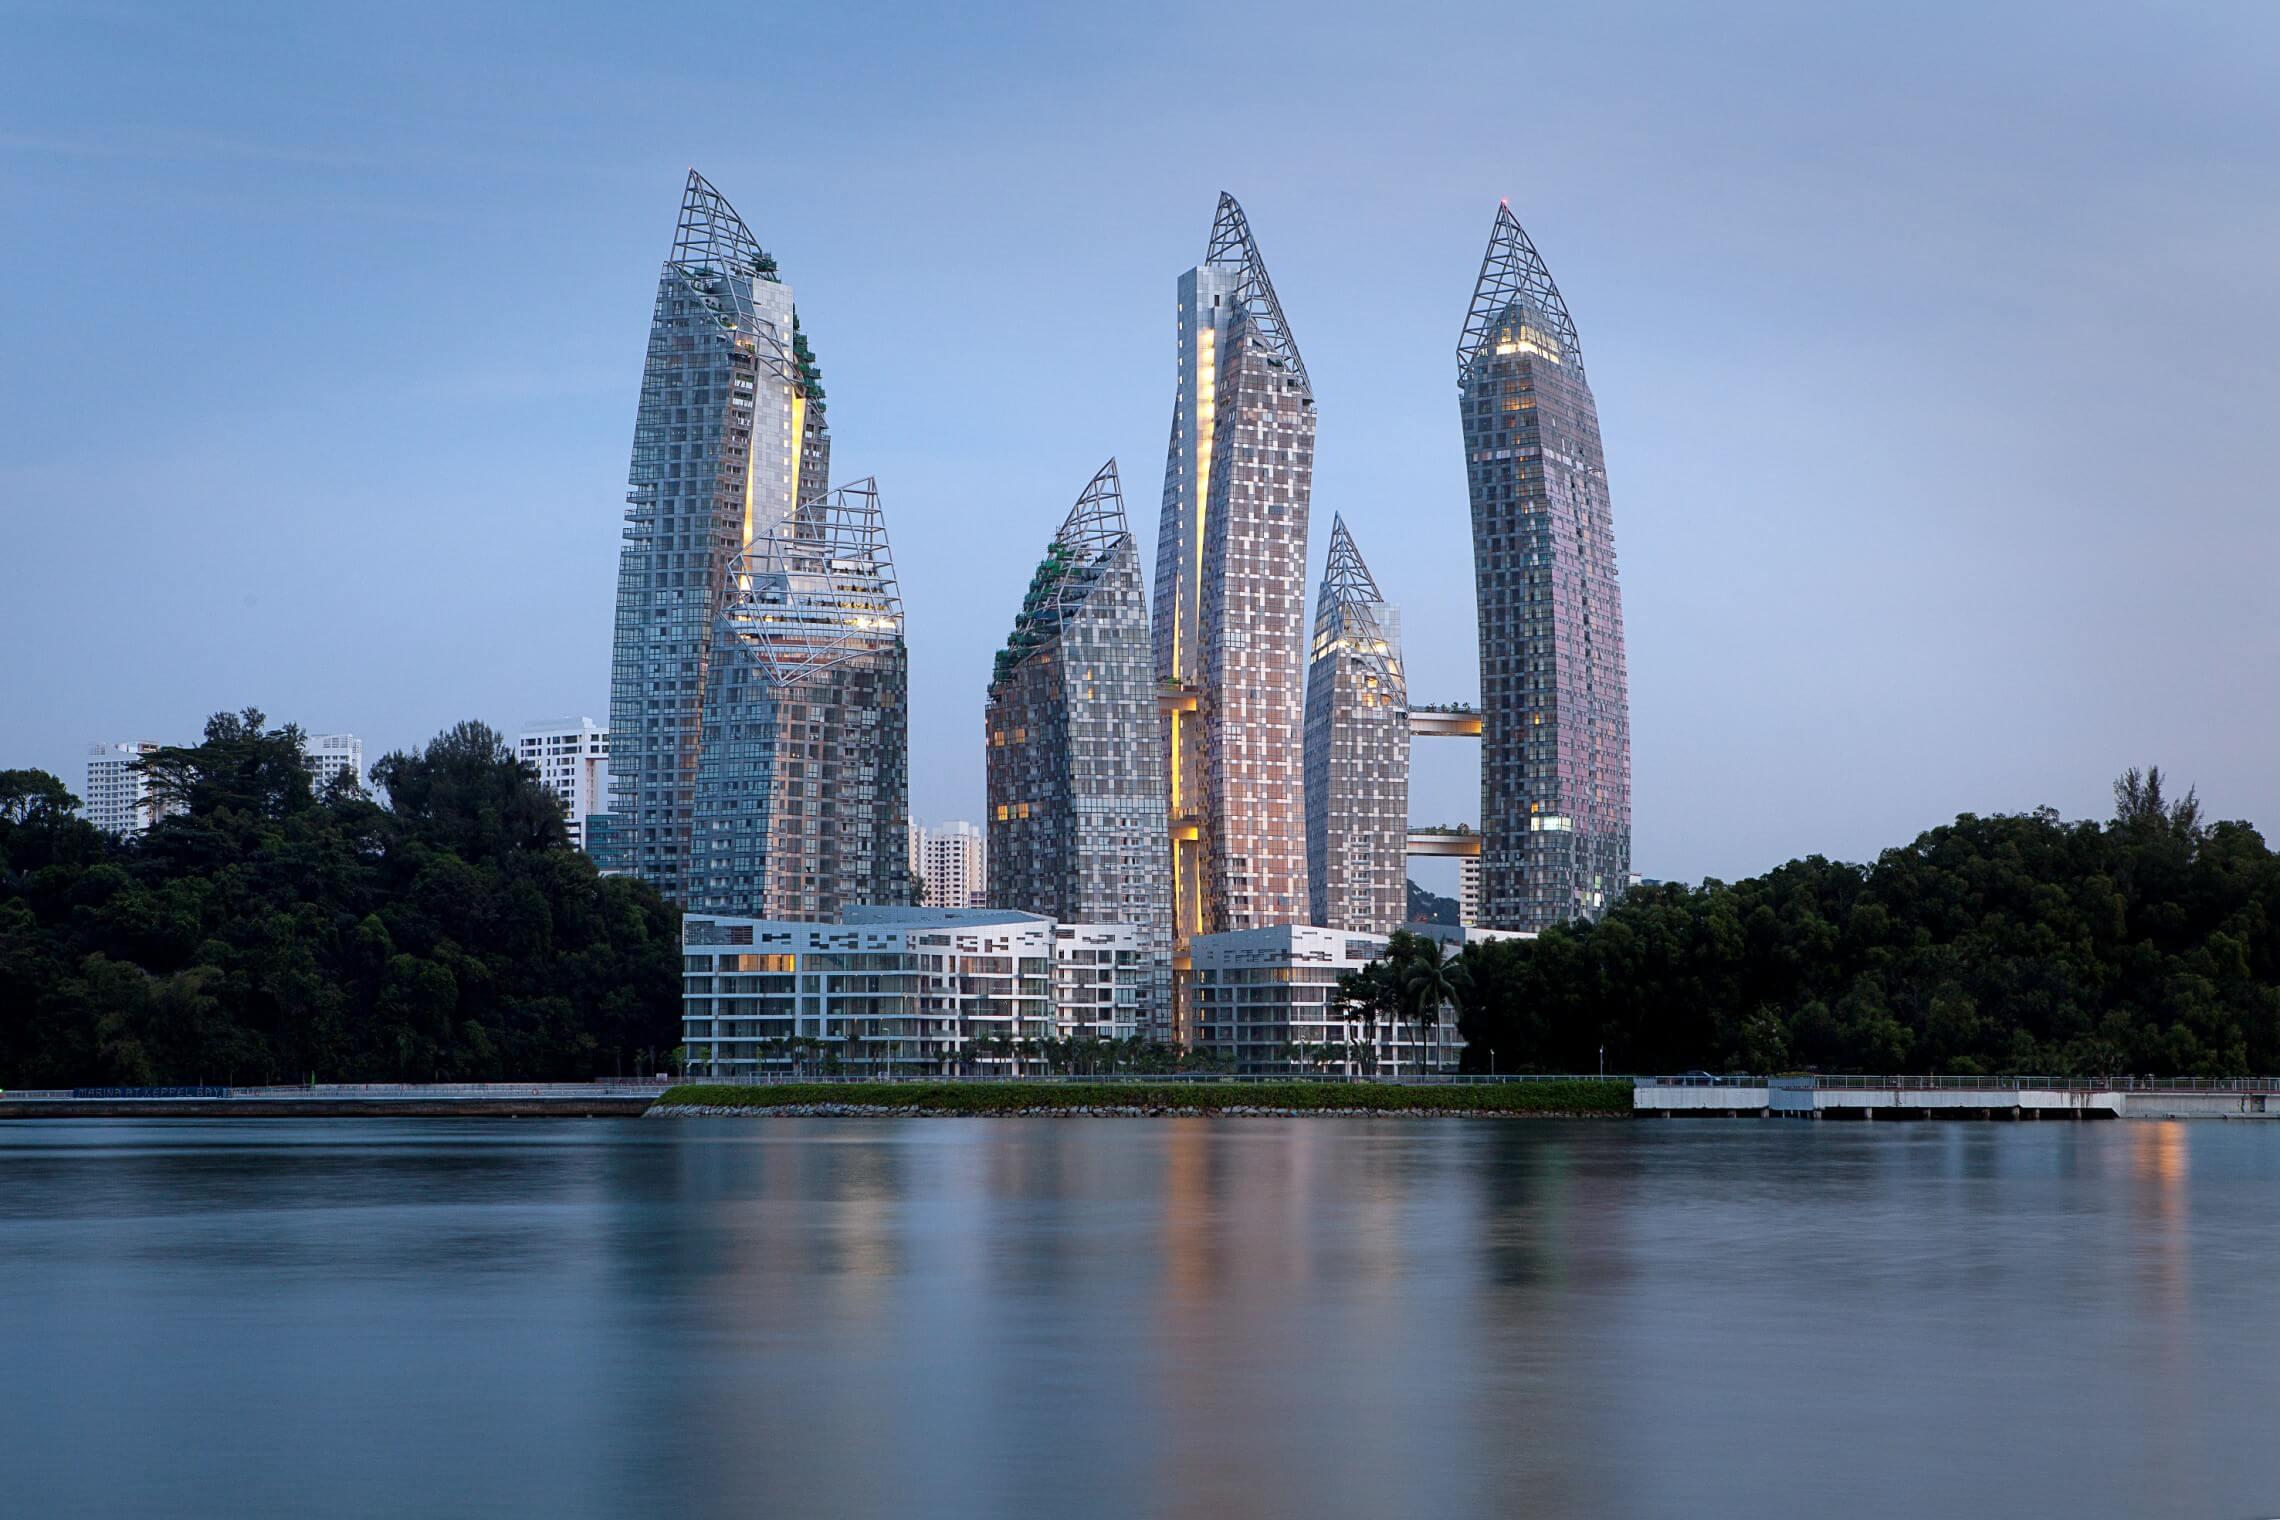 Singapore architecture 2 (1)